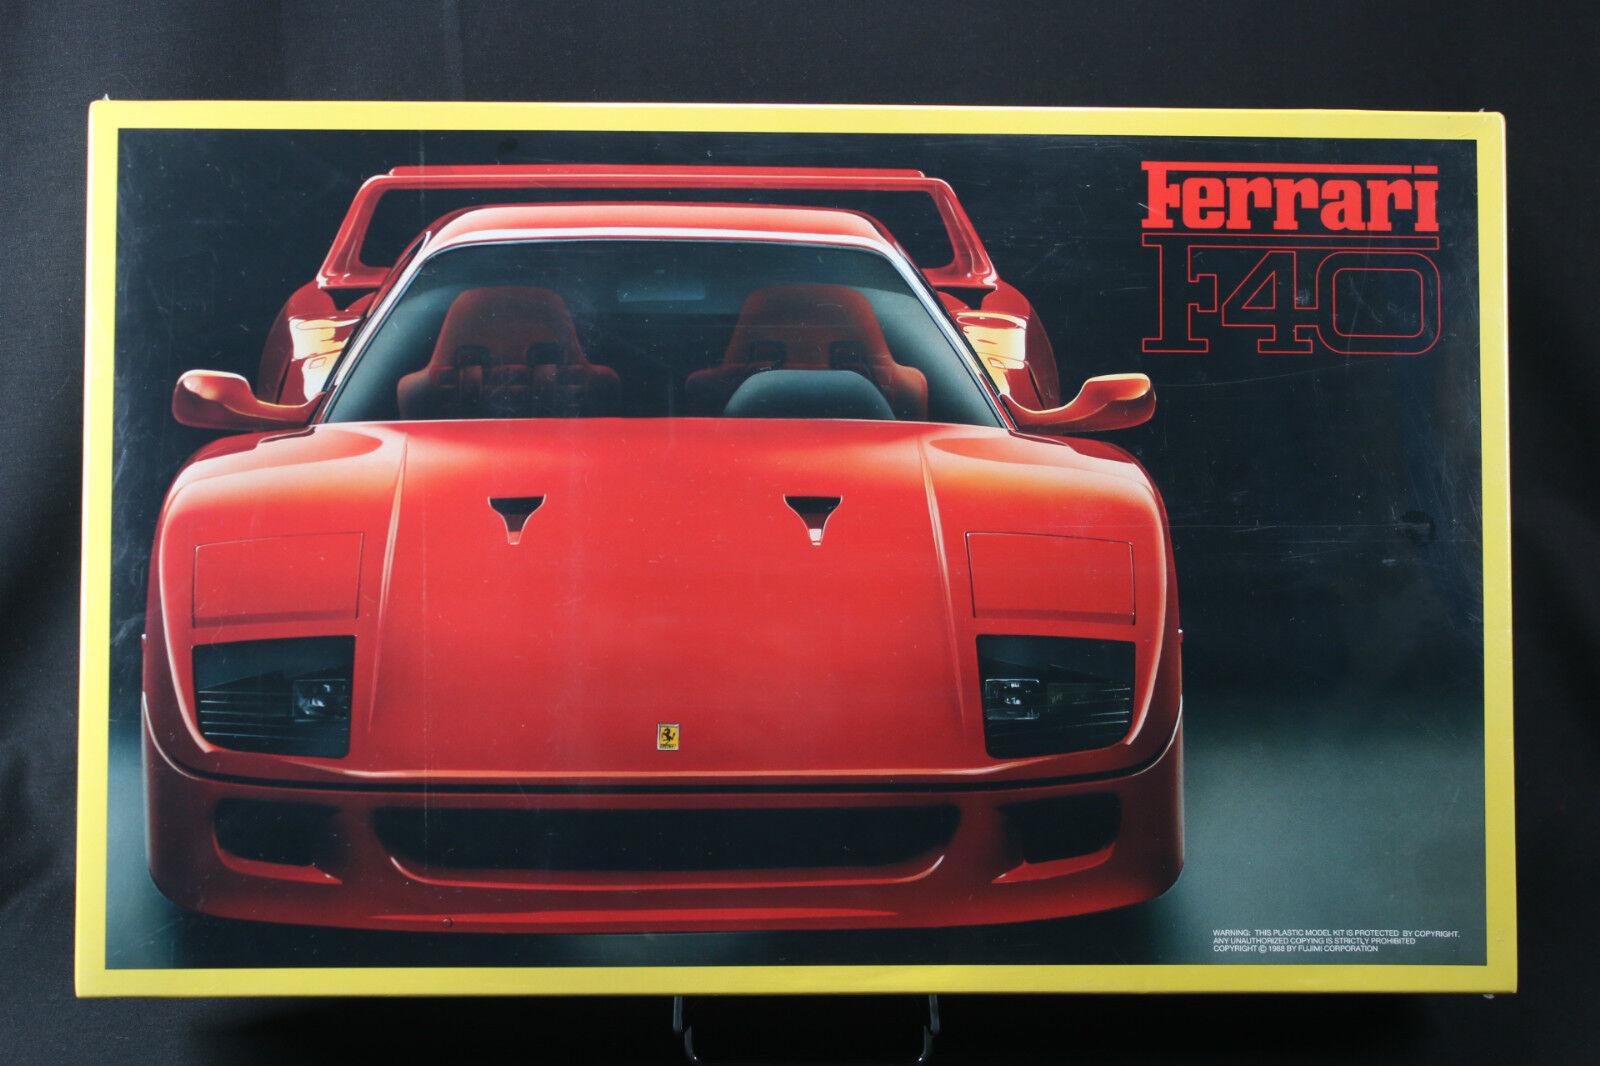 YJ007 Fujimi 1 16 Model Car 10110-RC110-4800 Ferrari F40 10110 1988 EM110